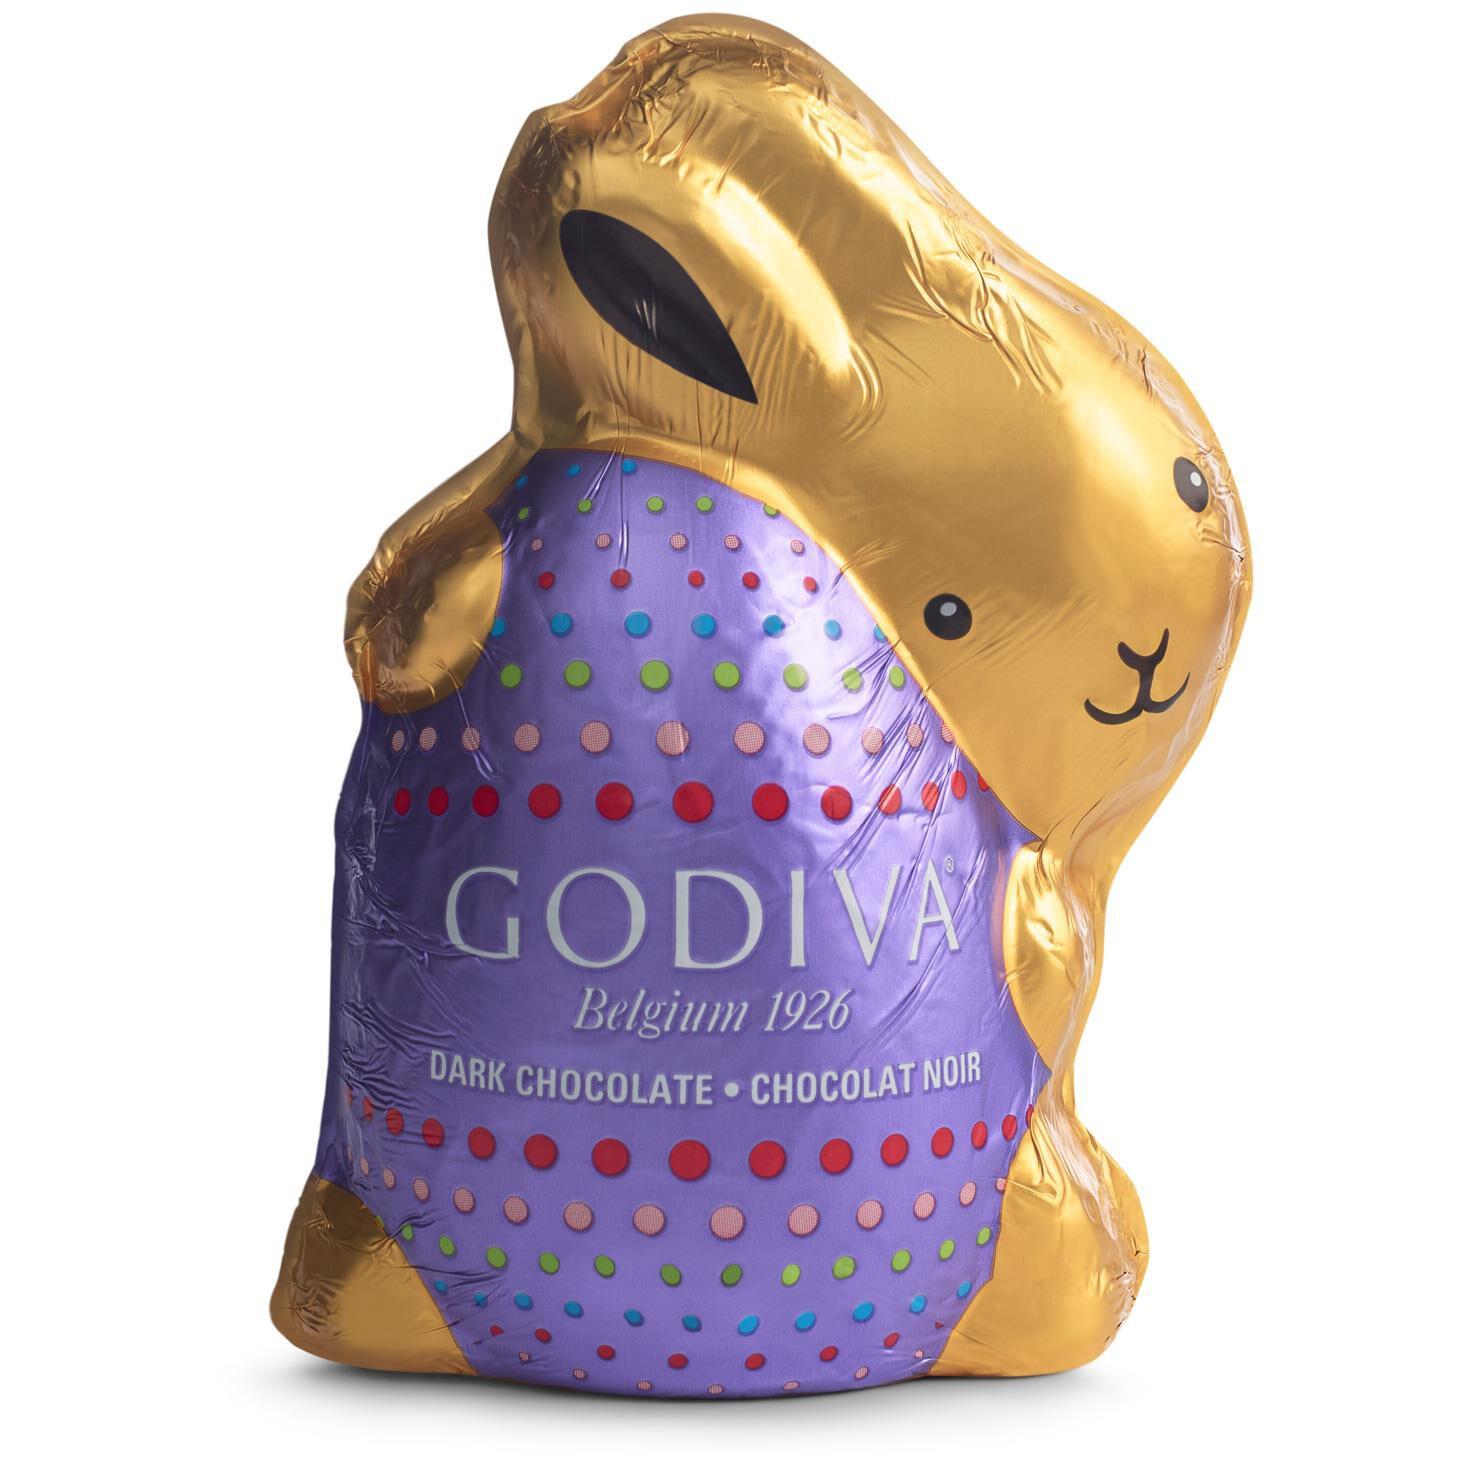 Godiva Foil-Wrapped Dark Chocolate Bunny, 4 oz. - Candy ...